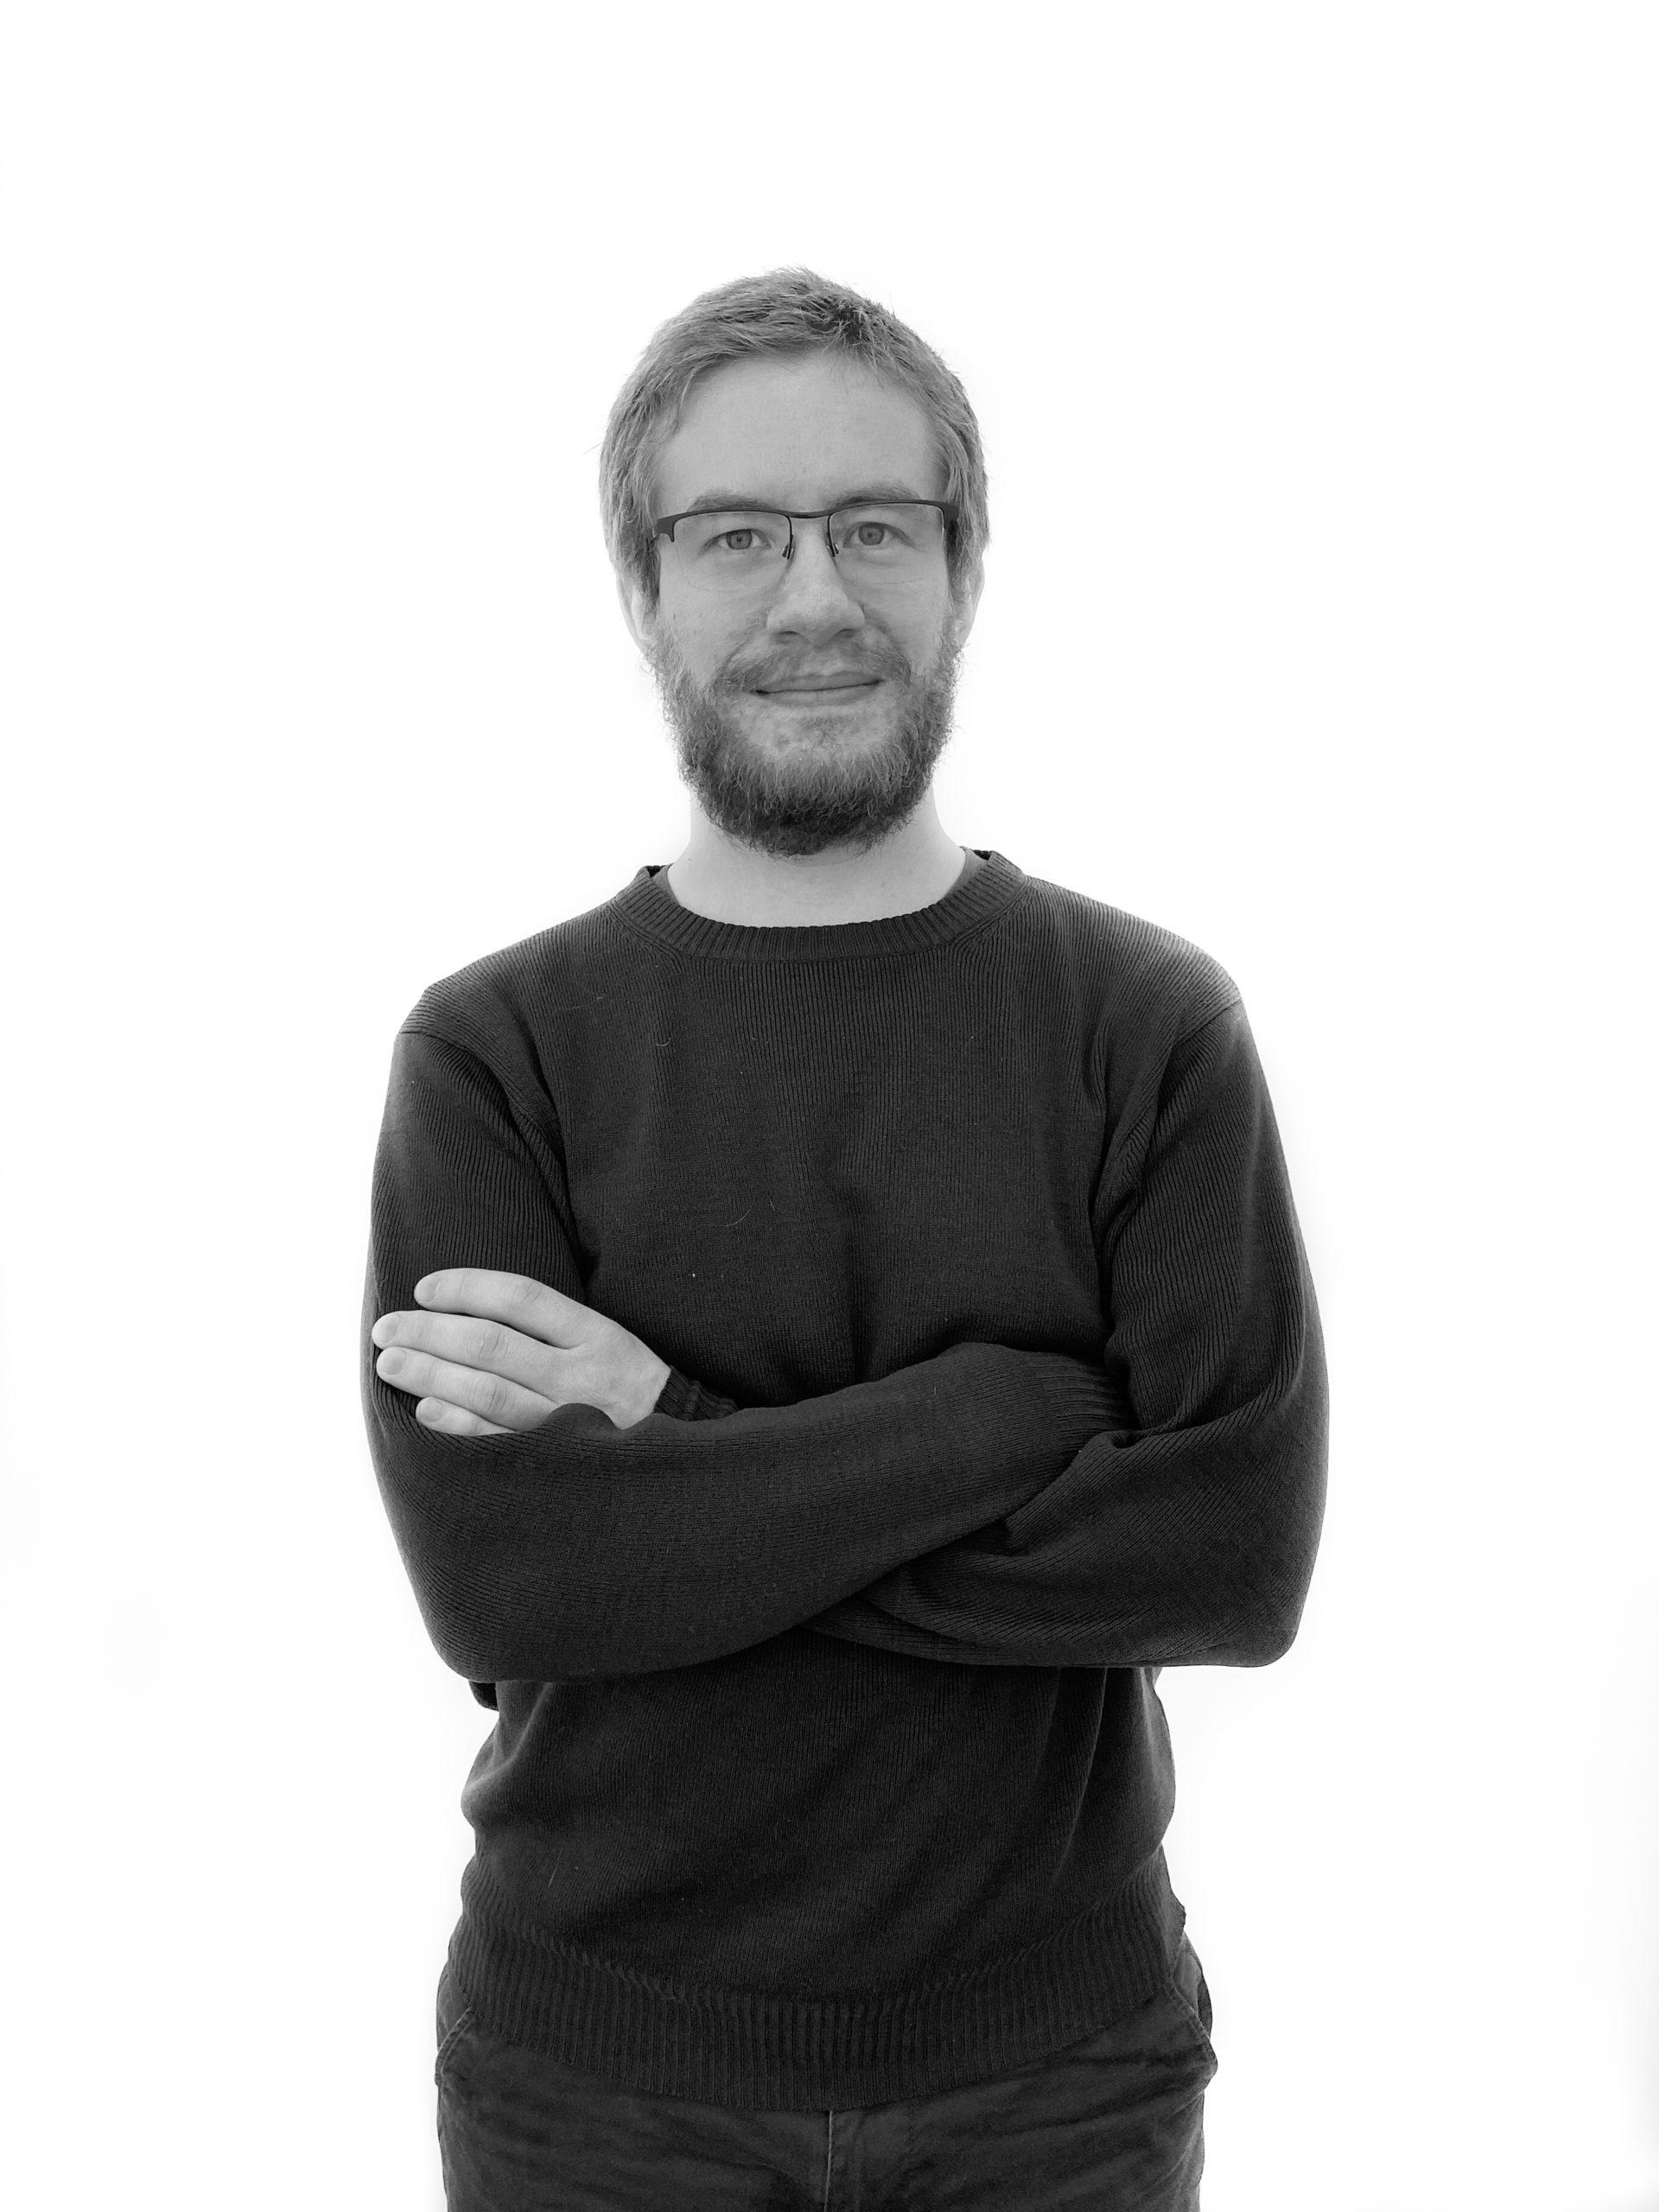 Christophe Duruisseau